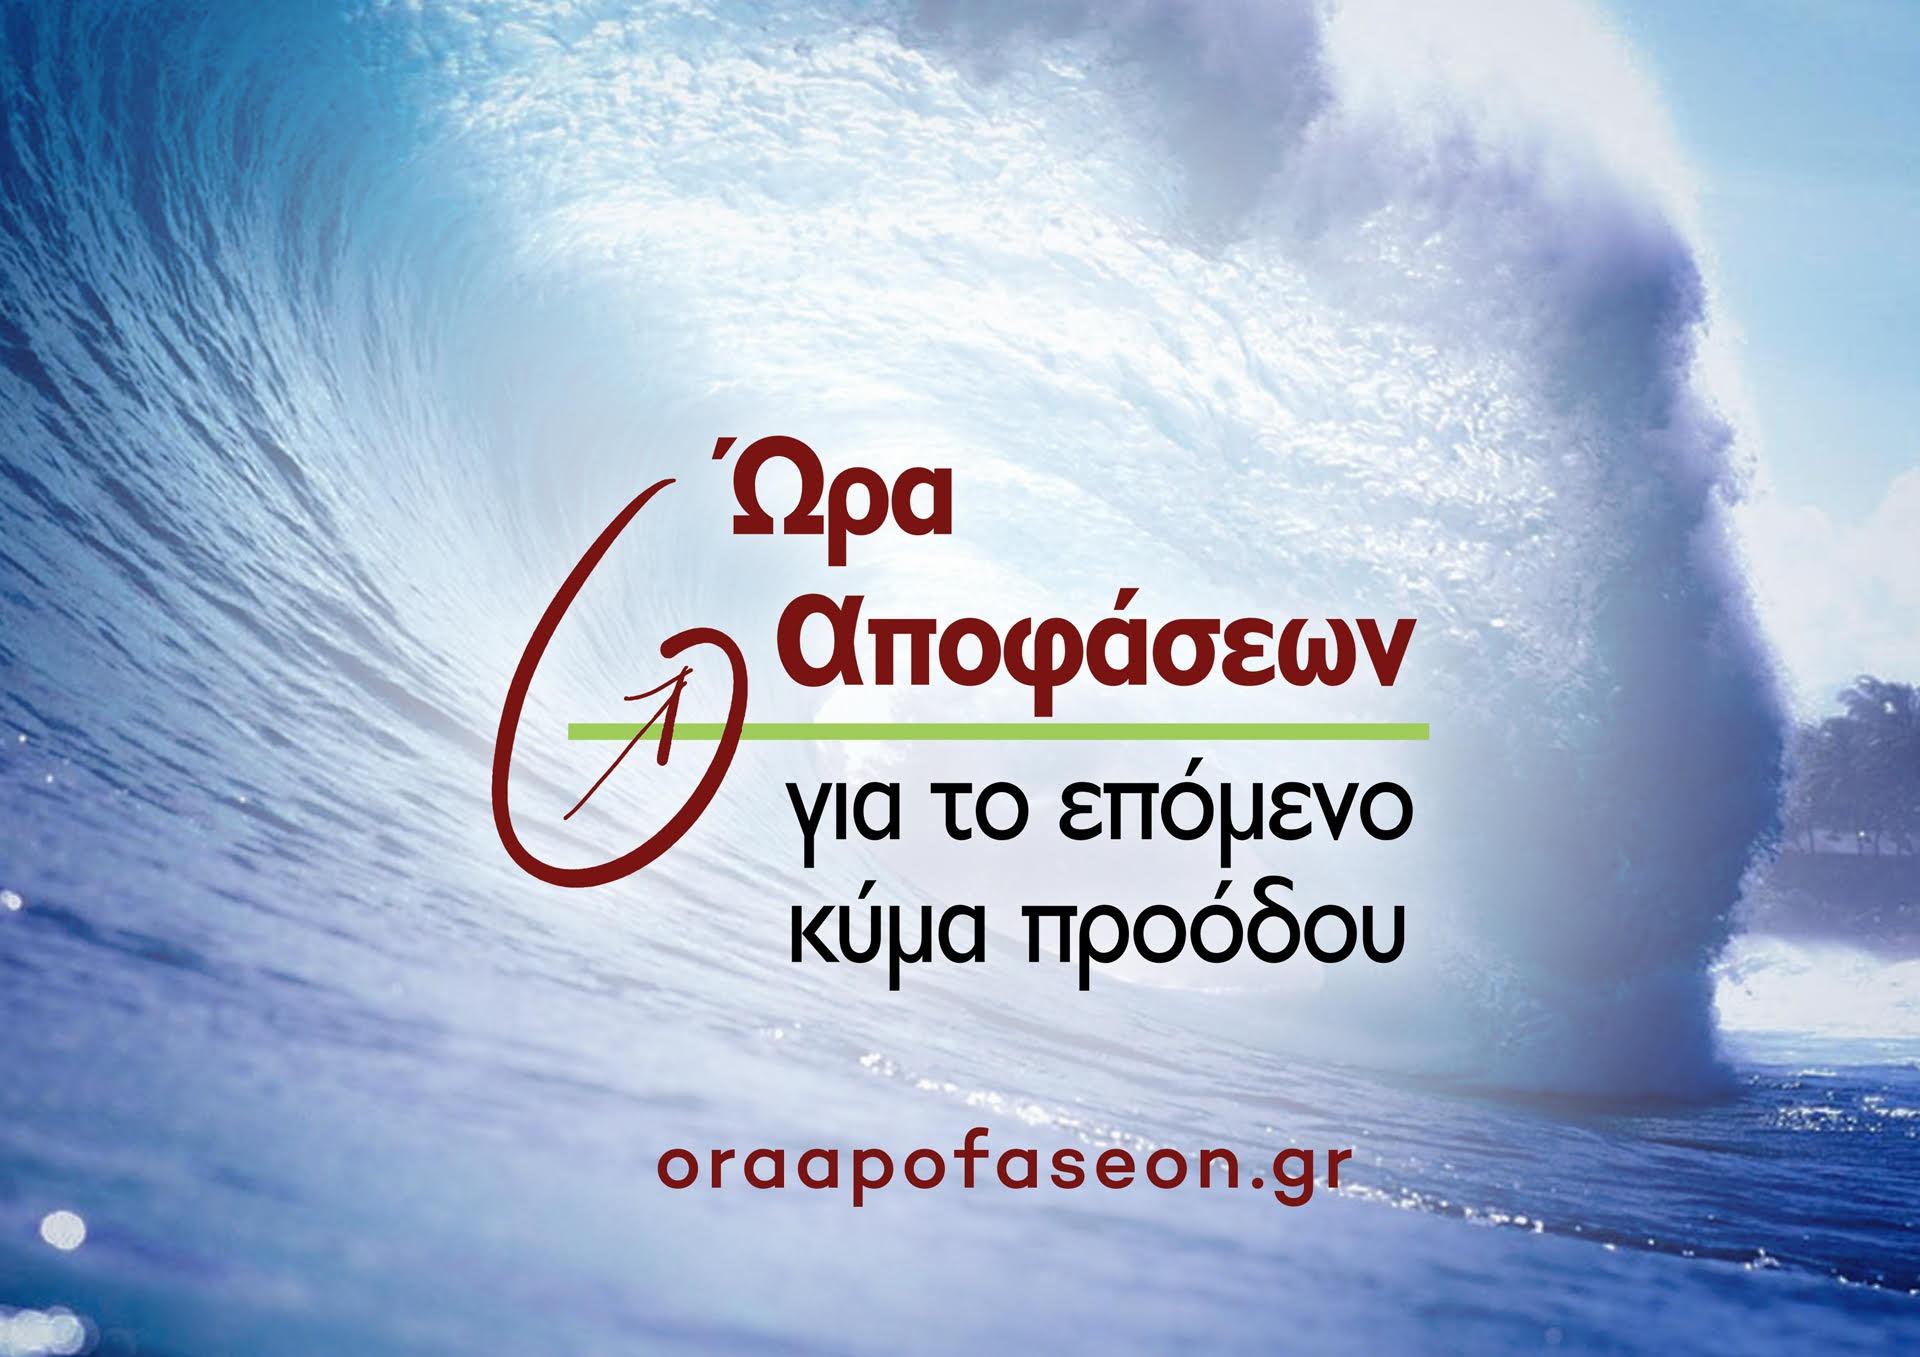 ora__apofaseon_image_1.jpg